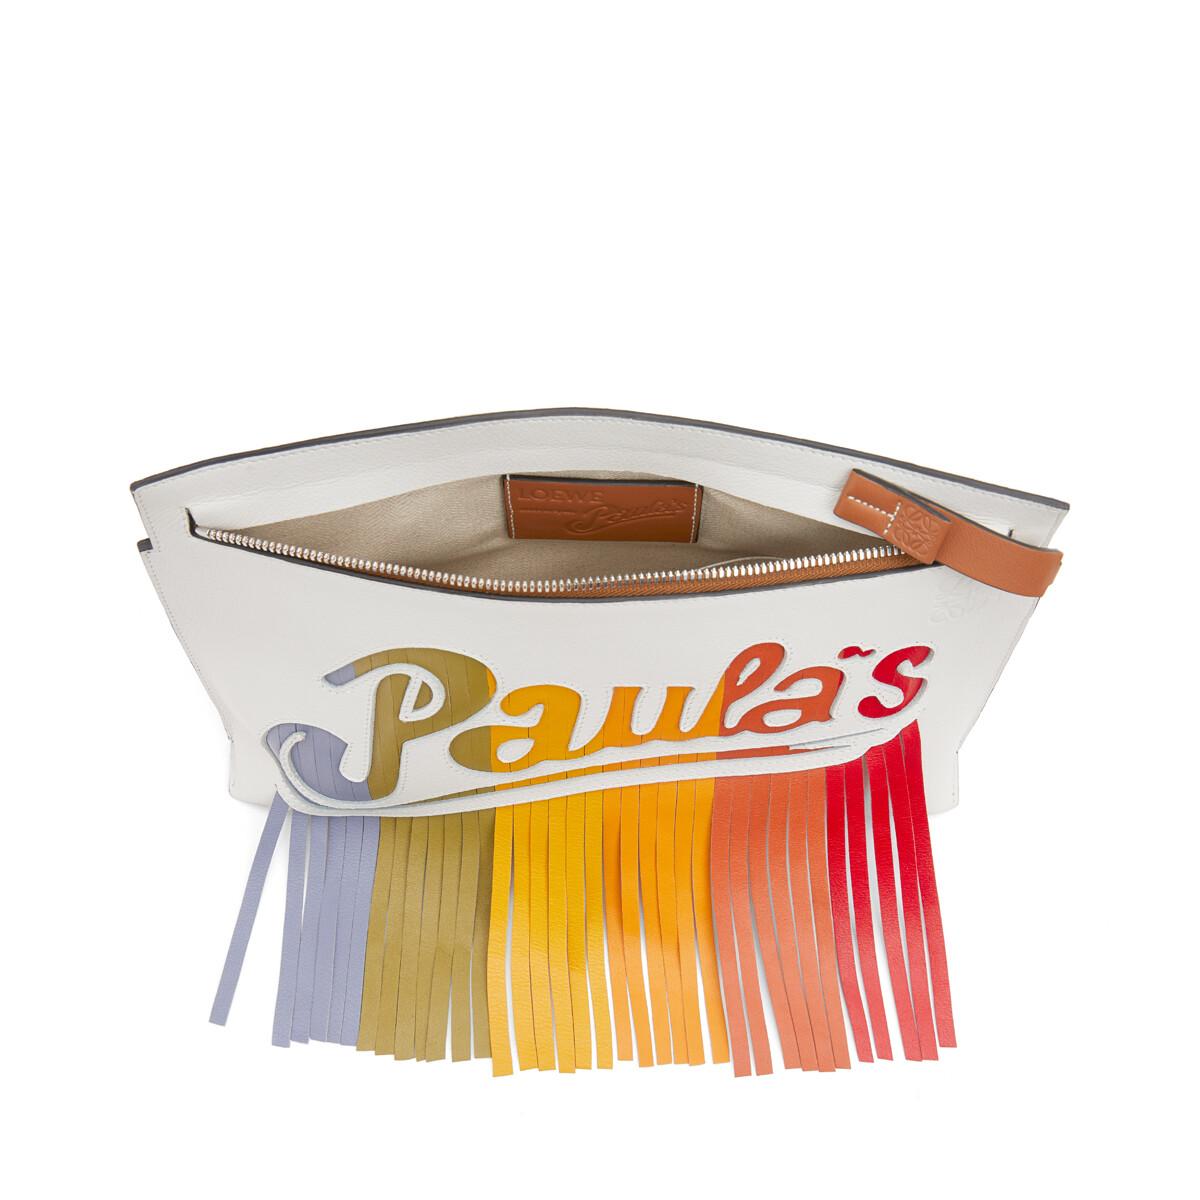 LOEWE Paula's T Pouch Bag 白色/多色 front